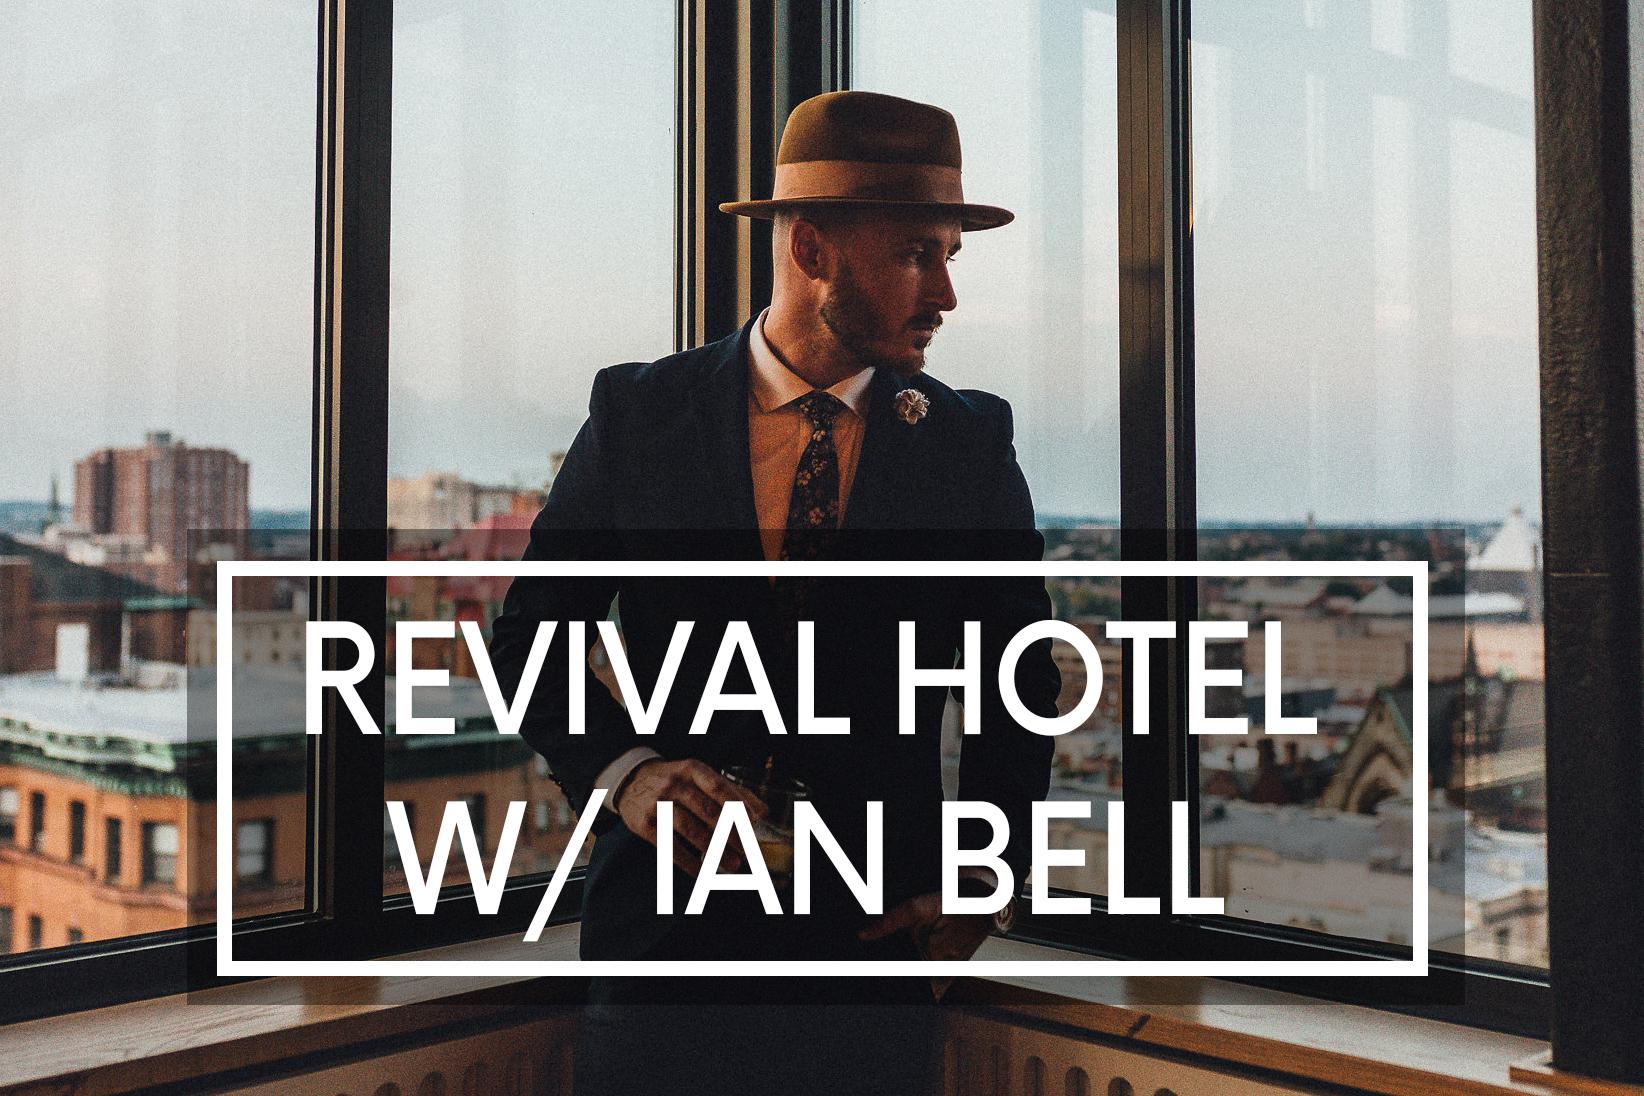 revival hotel.jpg